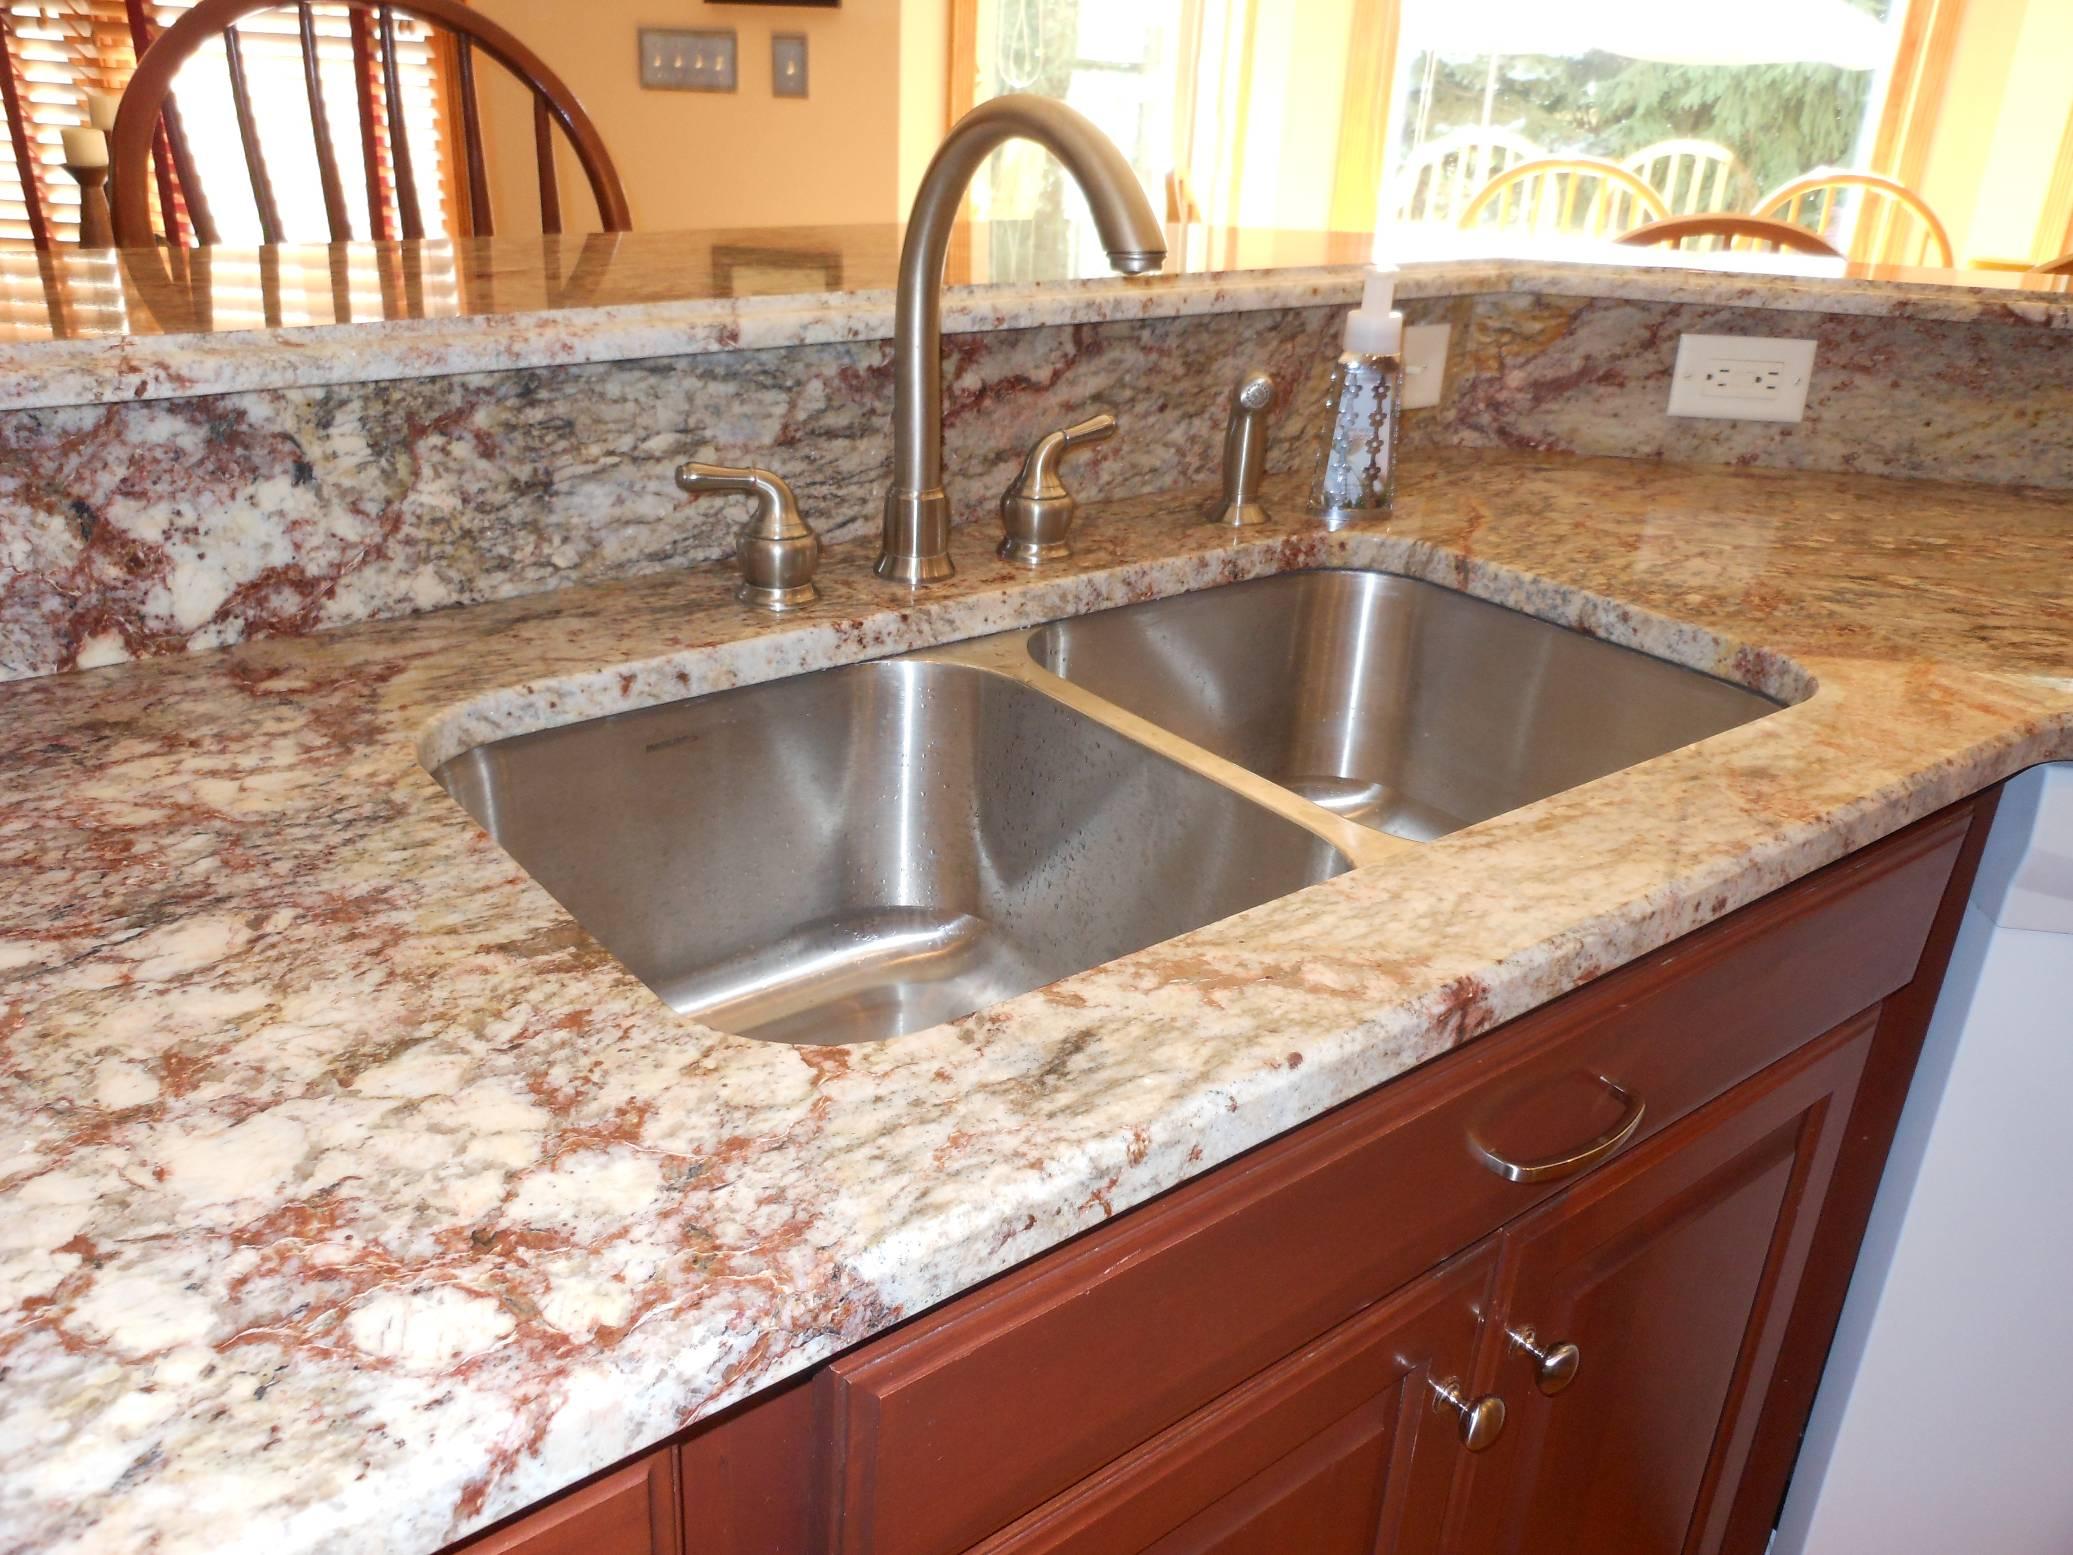 Great Stainless Steel Undermount Sink On Granite